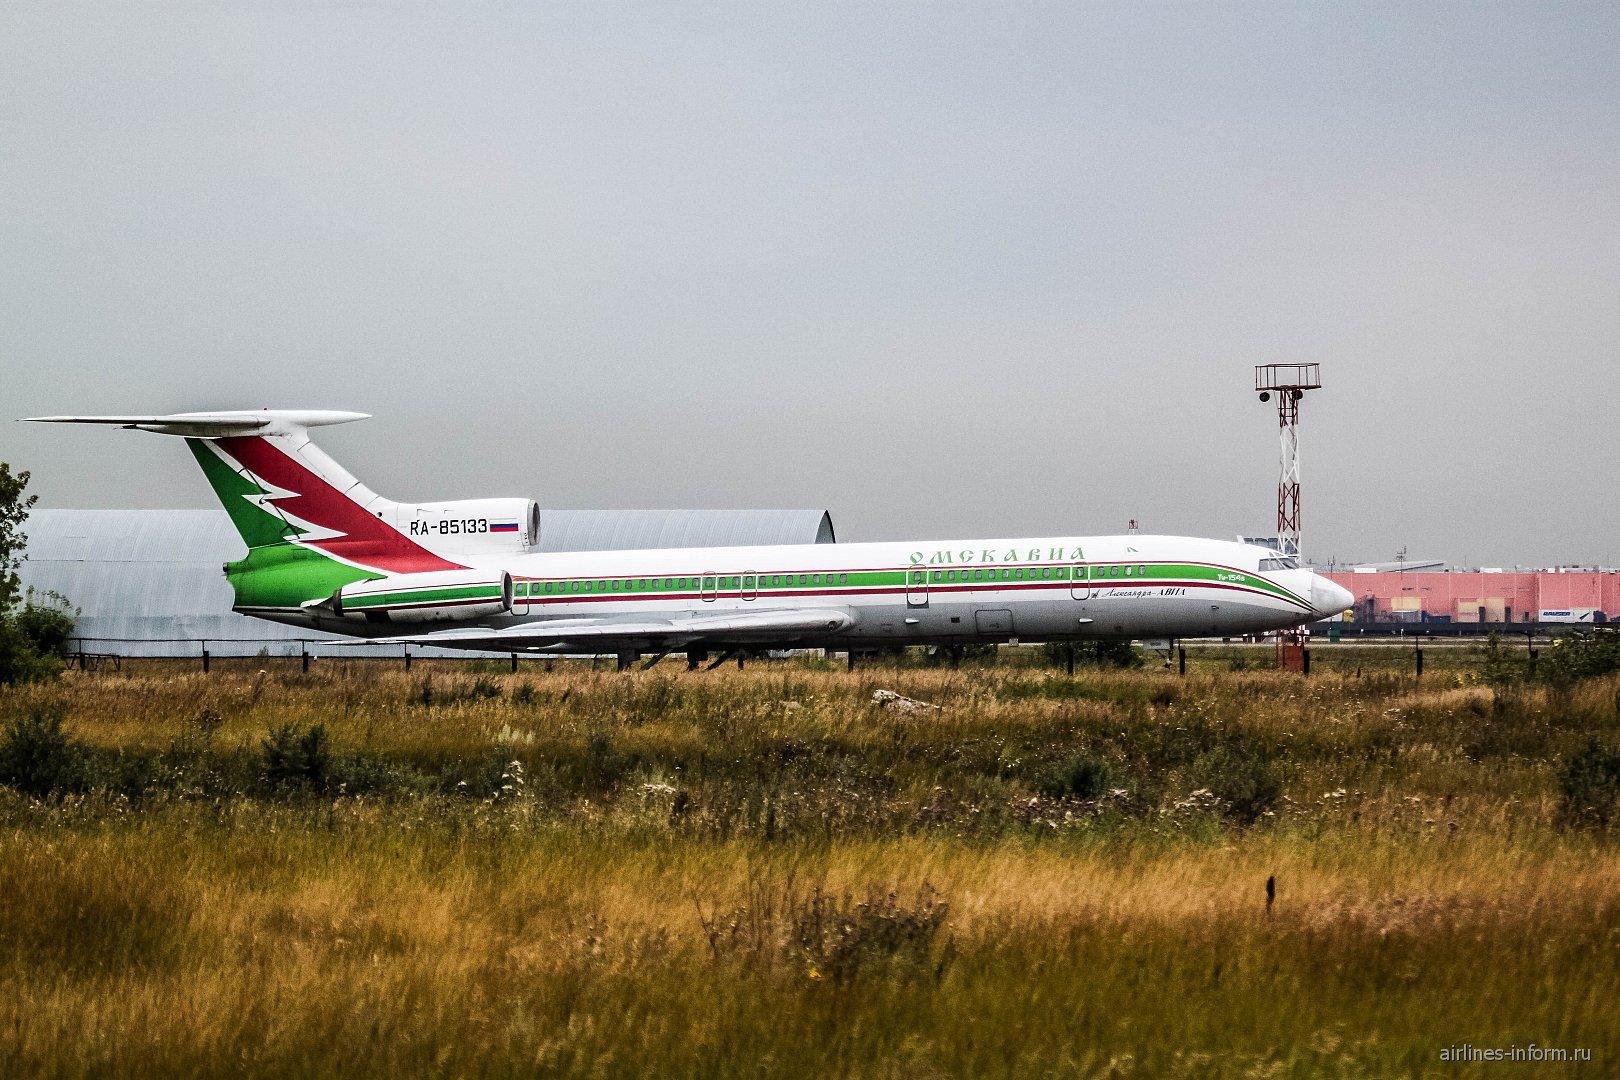 Самолет Ту-154 RA-85133